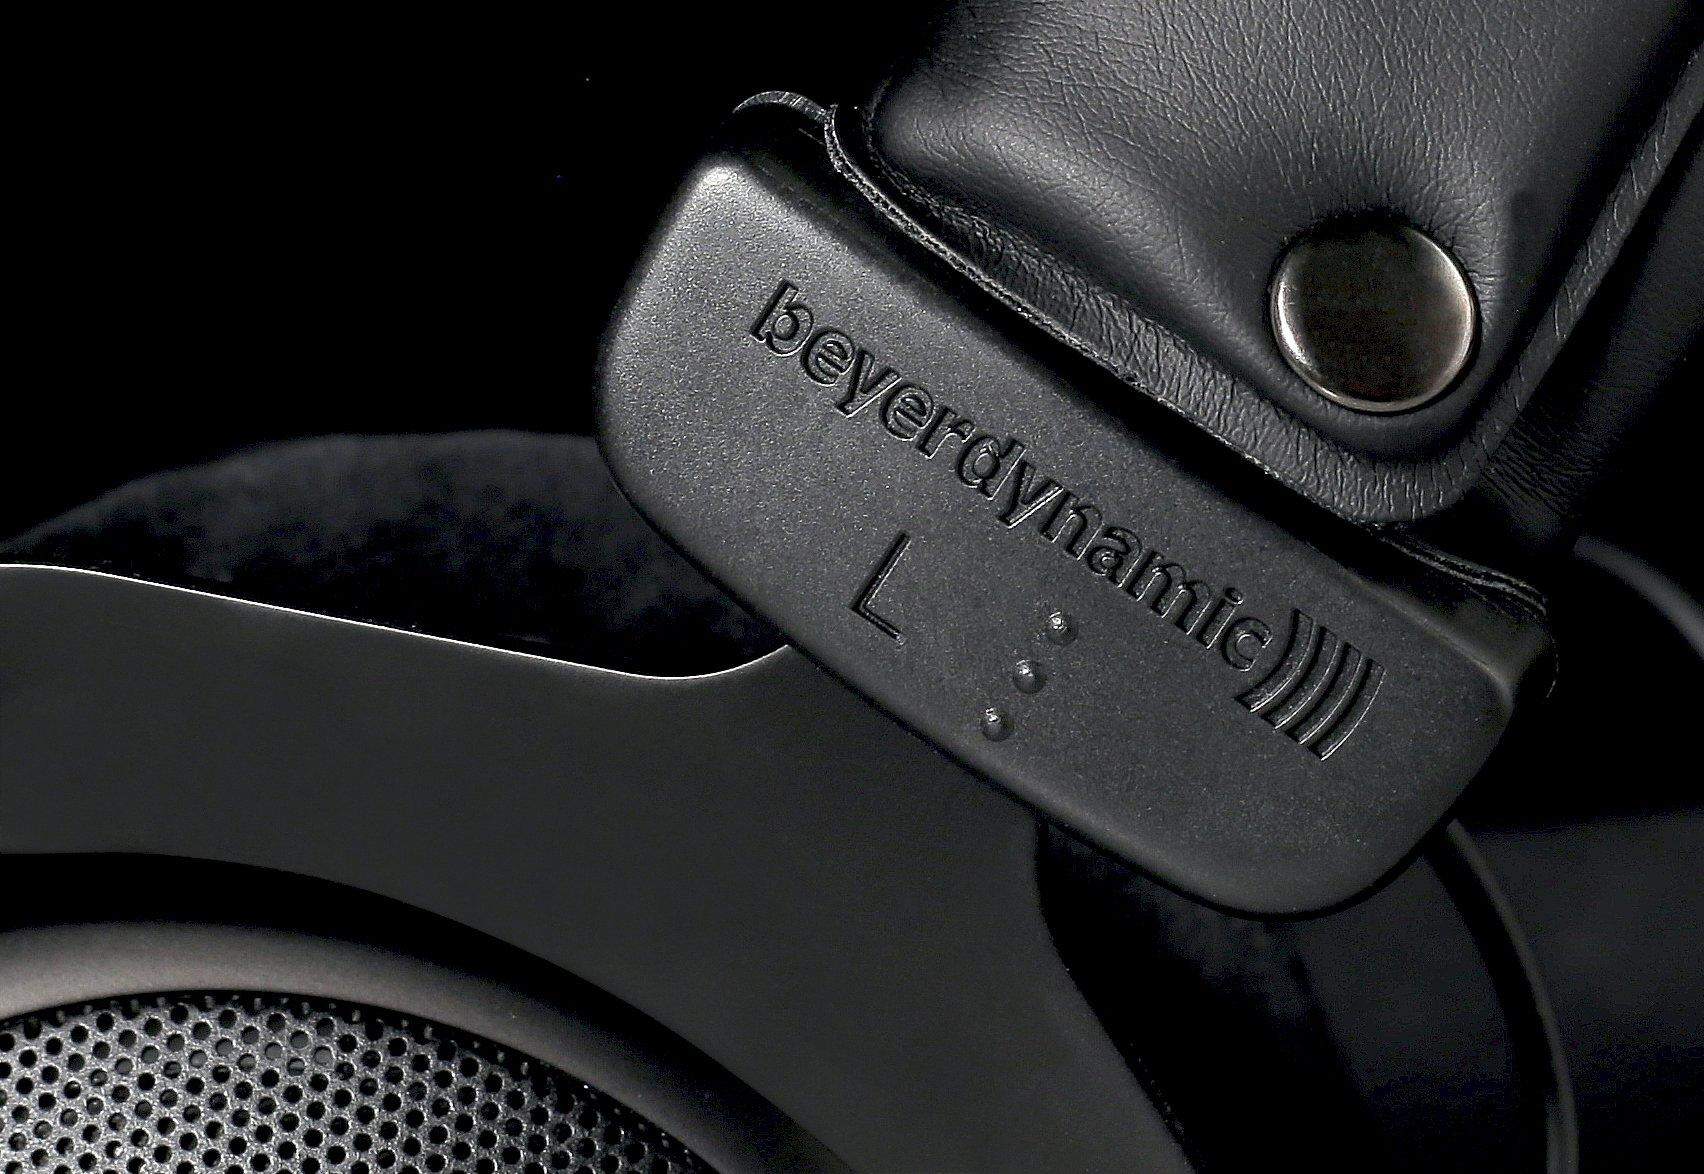 beyerdynamic Dt 880 250 Ohm Pro Semi-Open Studio Headphones Black (Limited  Edition): Buy Online at Best Price in KSA - Souq is now Amazon.sa